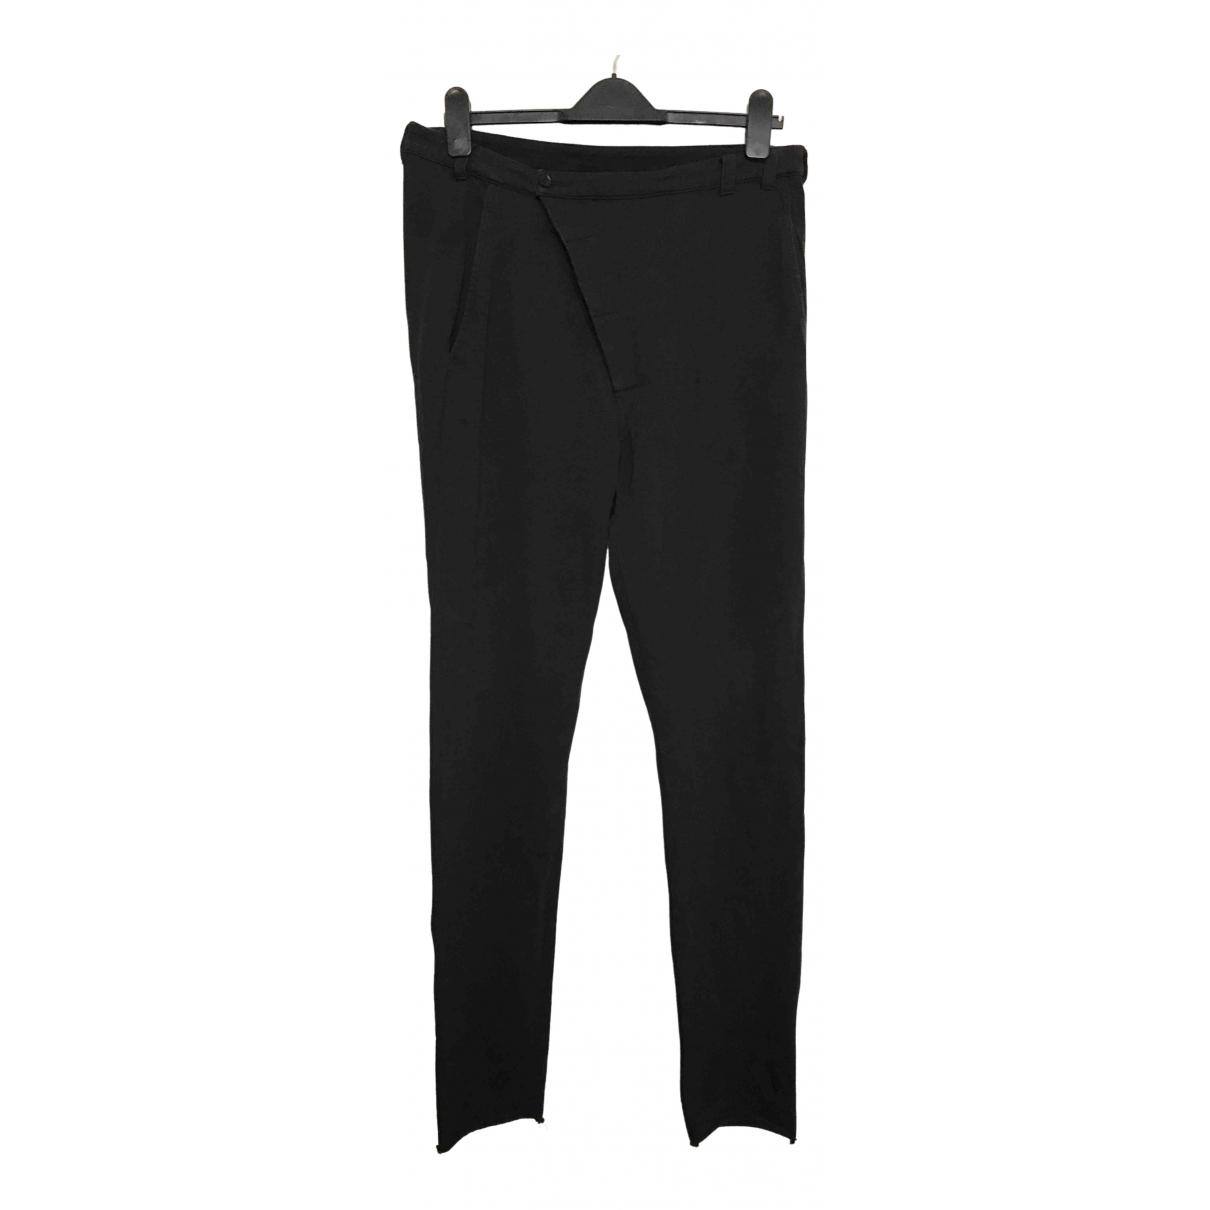 Pantalones en Algodon Negro Thom Krom